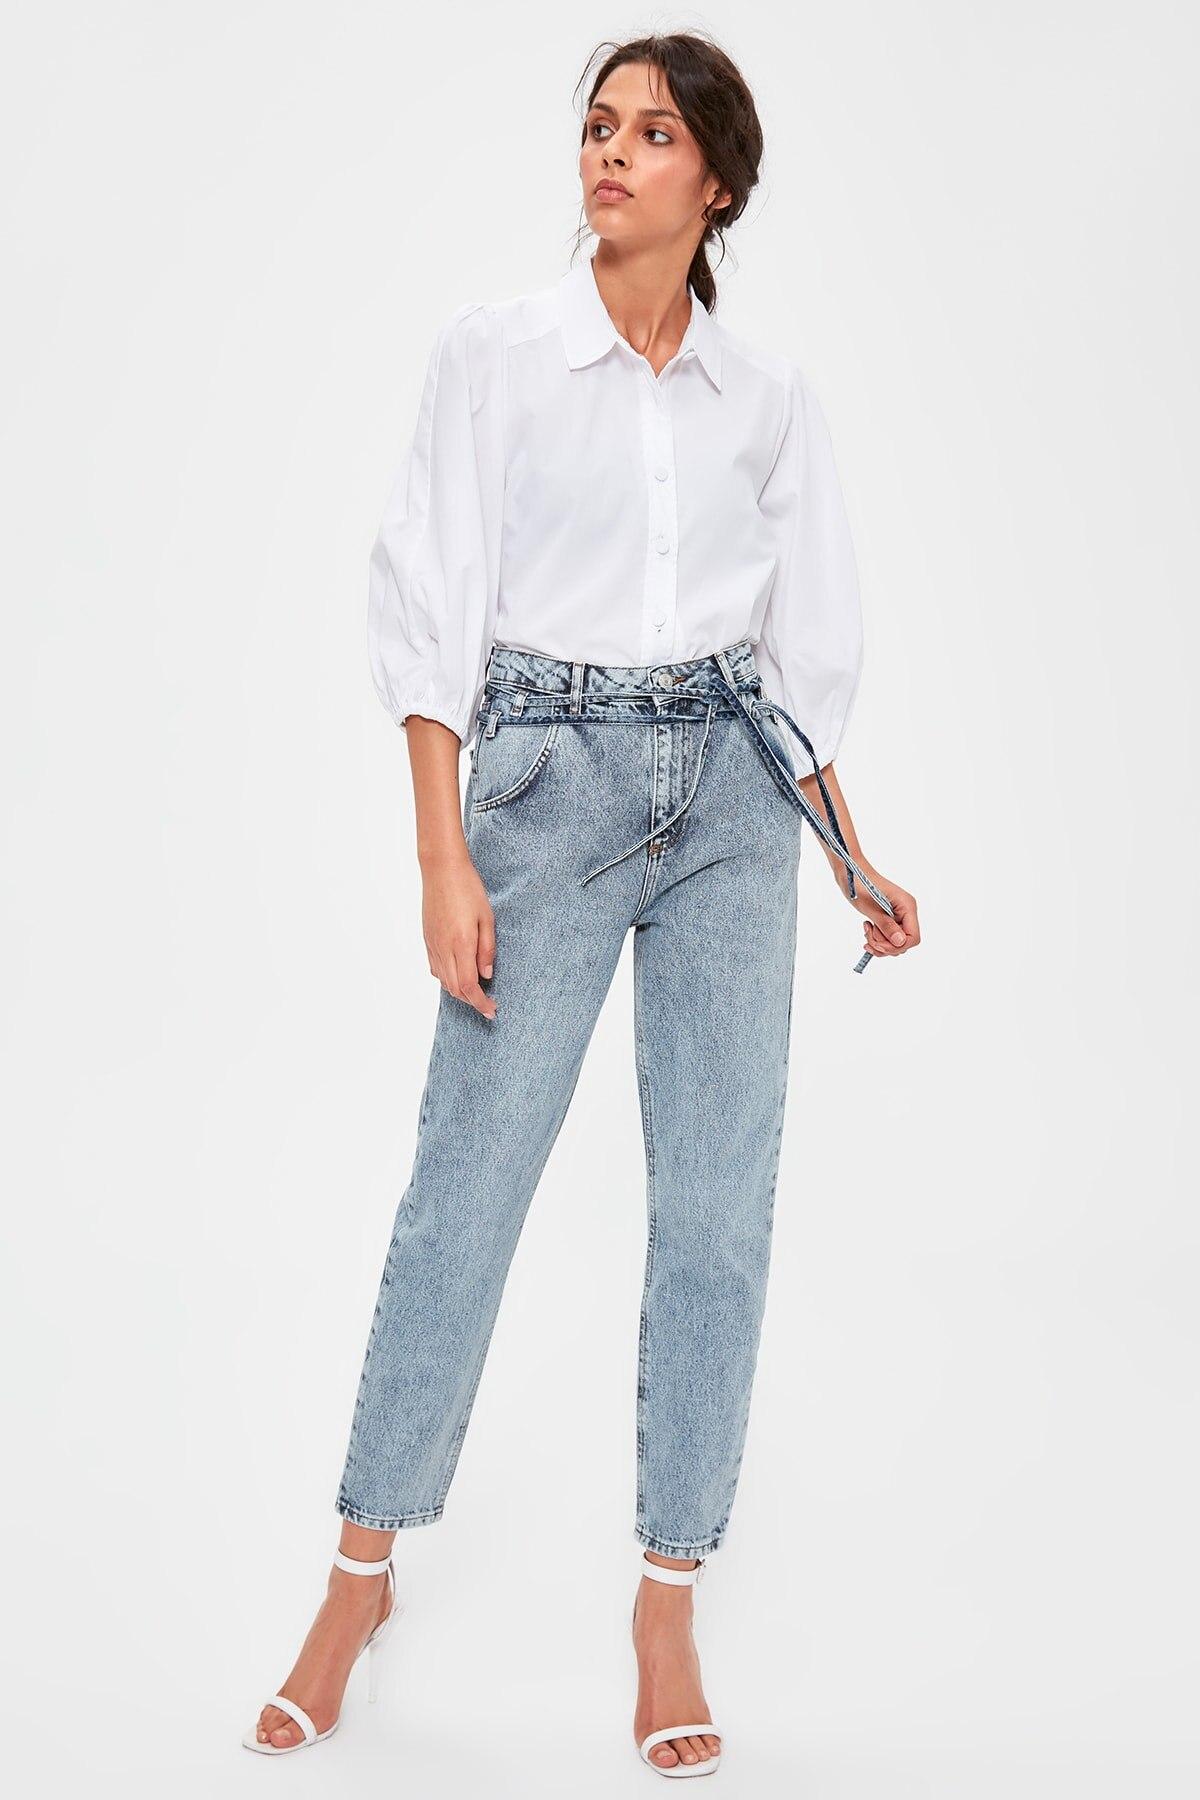 Trendyol cordones azul detallada alta Bel Mom Jeans TWOAW20JE0189